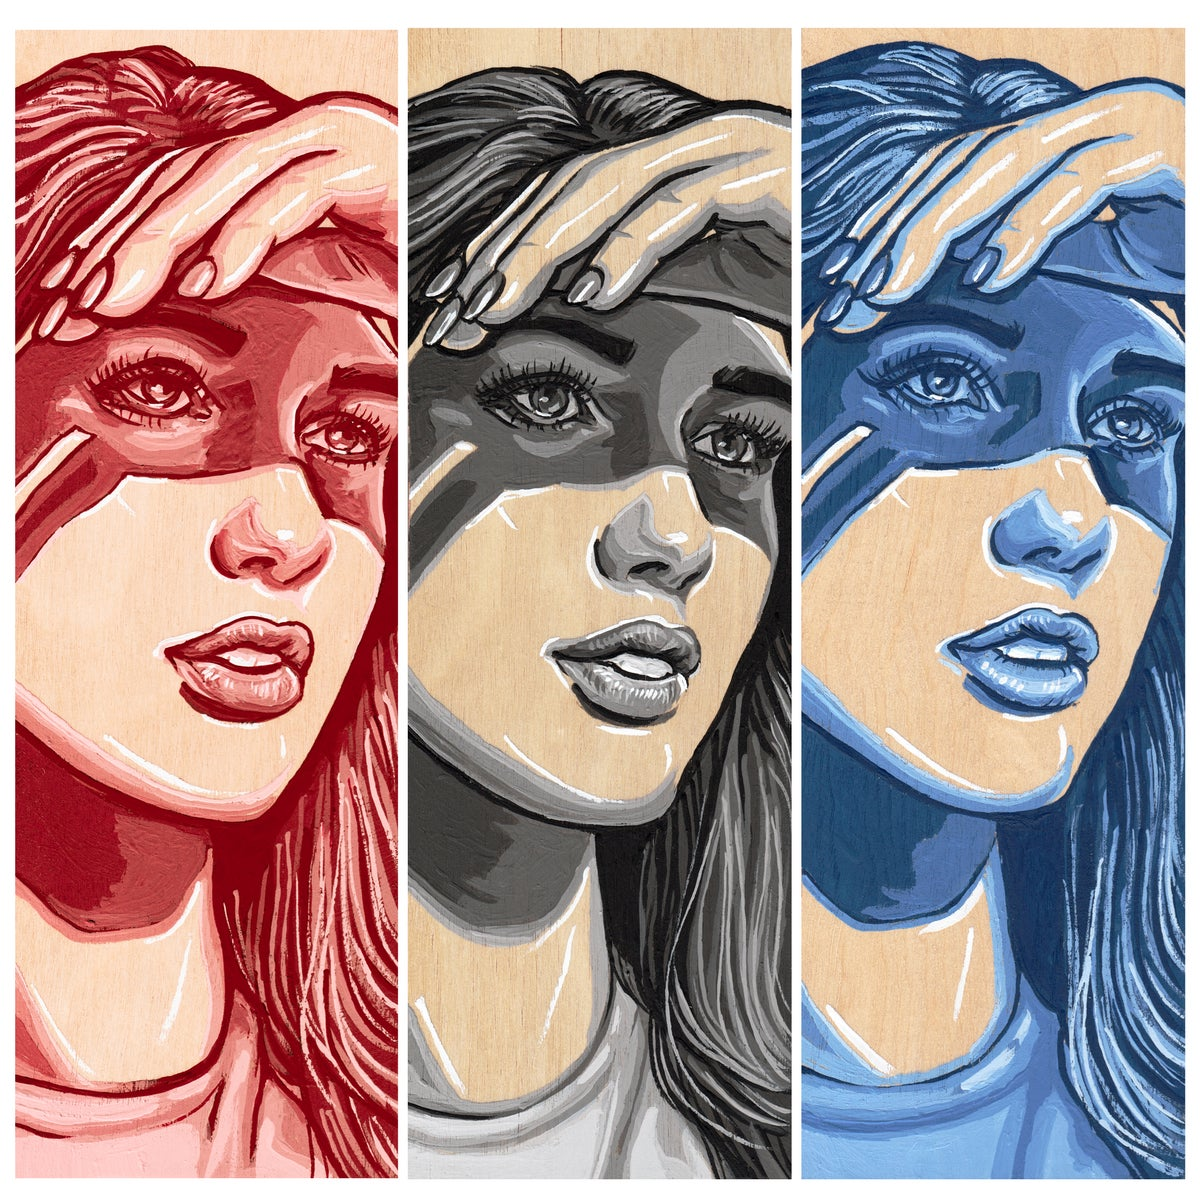 Image of She Shady II - Red, Gray, & Blue - Original Artwork